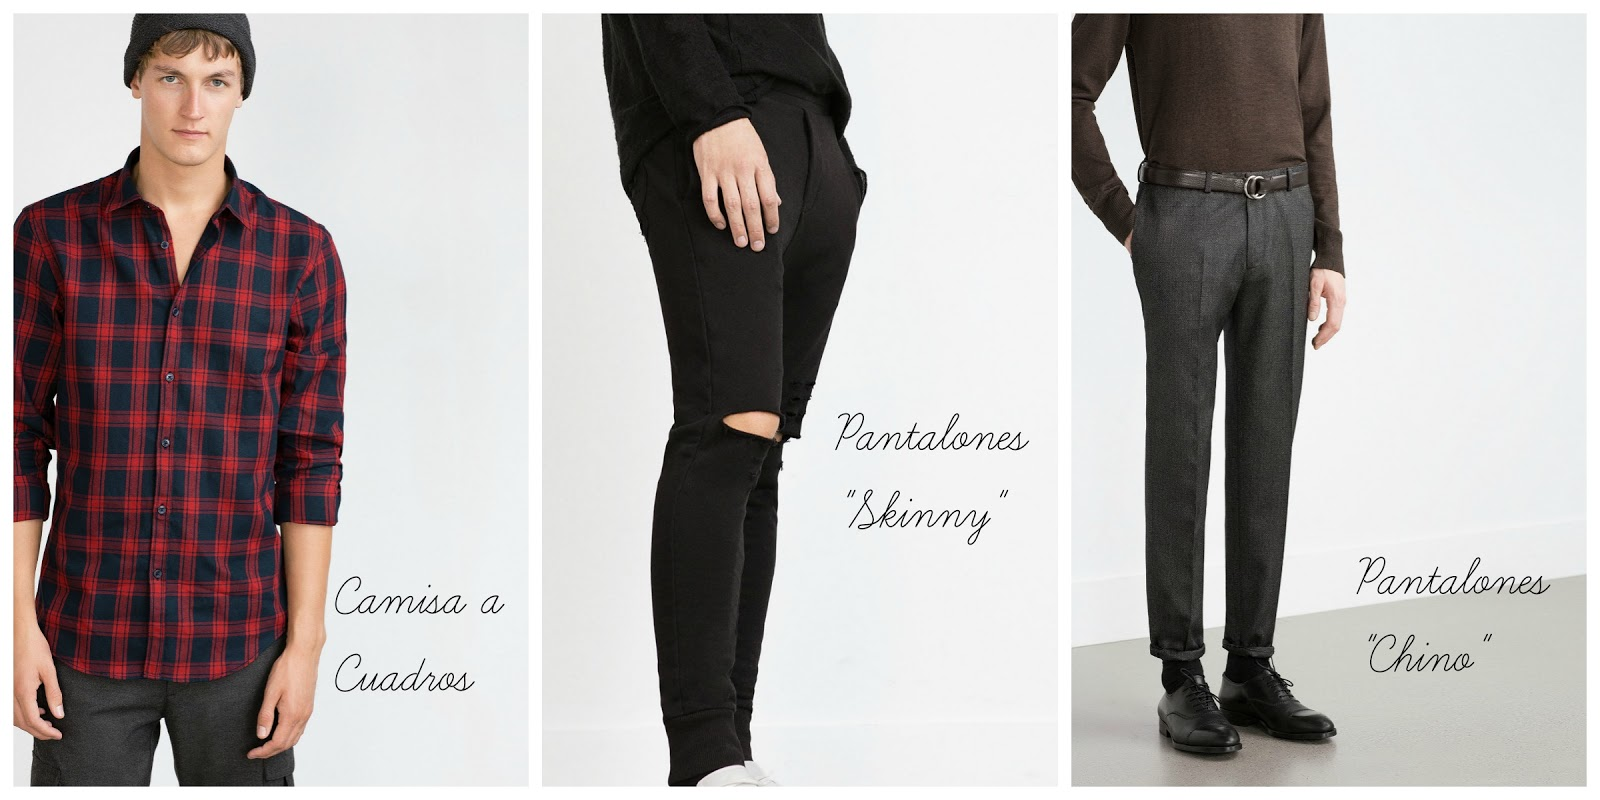 bbc1108bb5c FashionBlogger: Tendencias Otoño/Invierno 2015-2016 Hombre